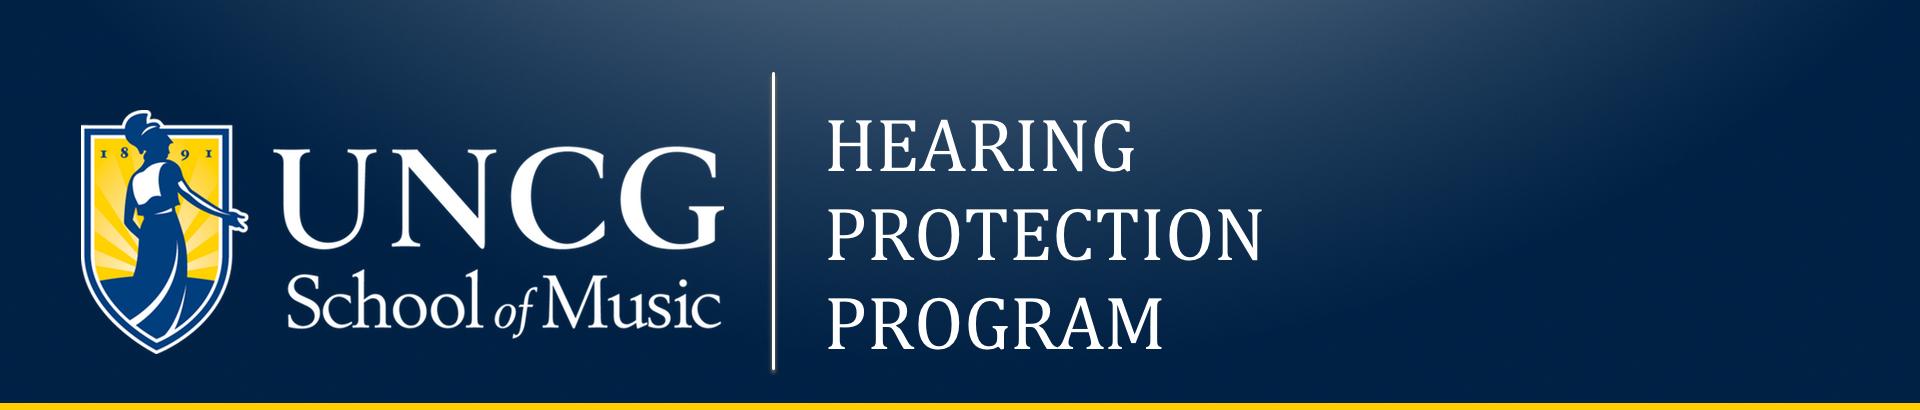 UNCG Hearing protection program